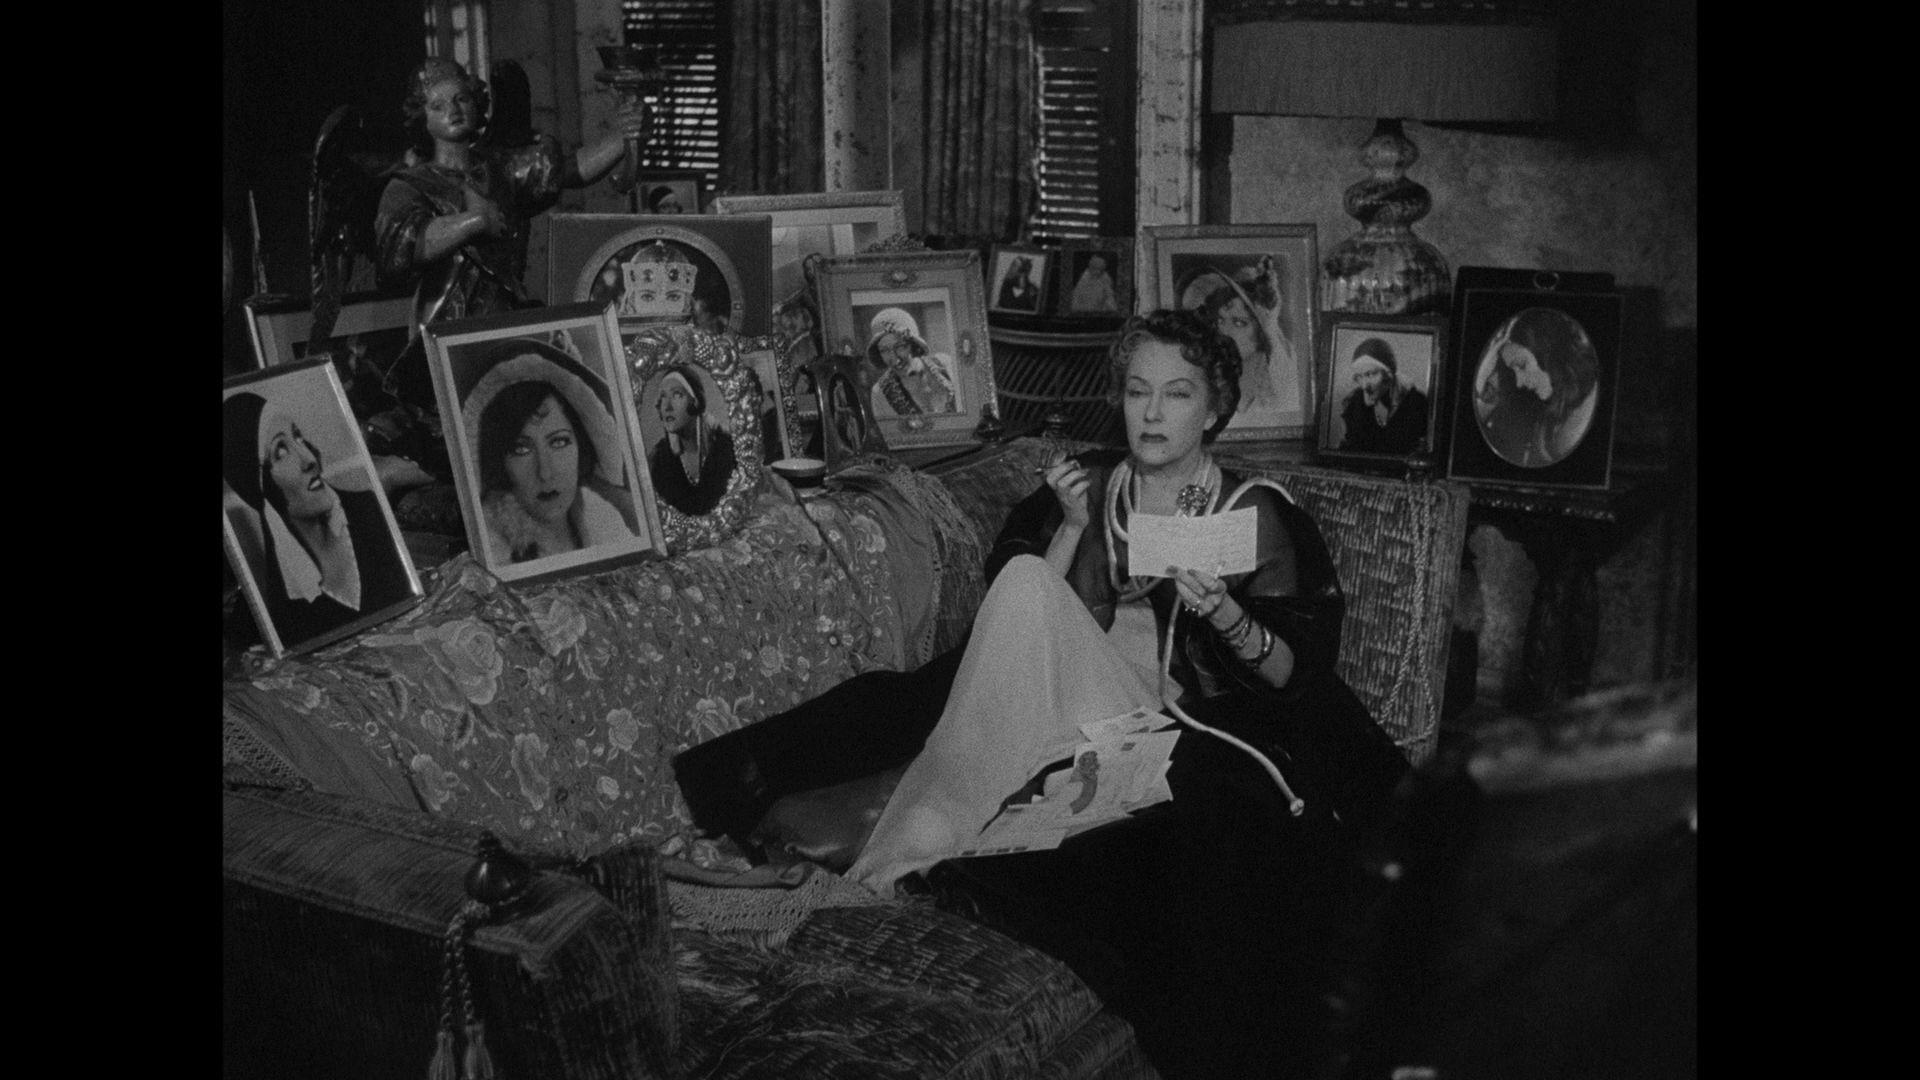 Sunset Boulevard Review Film stills, Film noir, Old